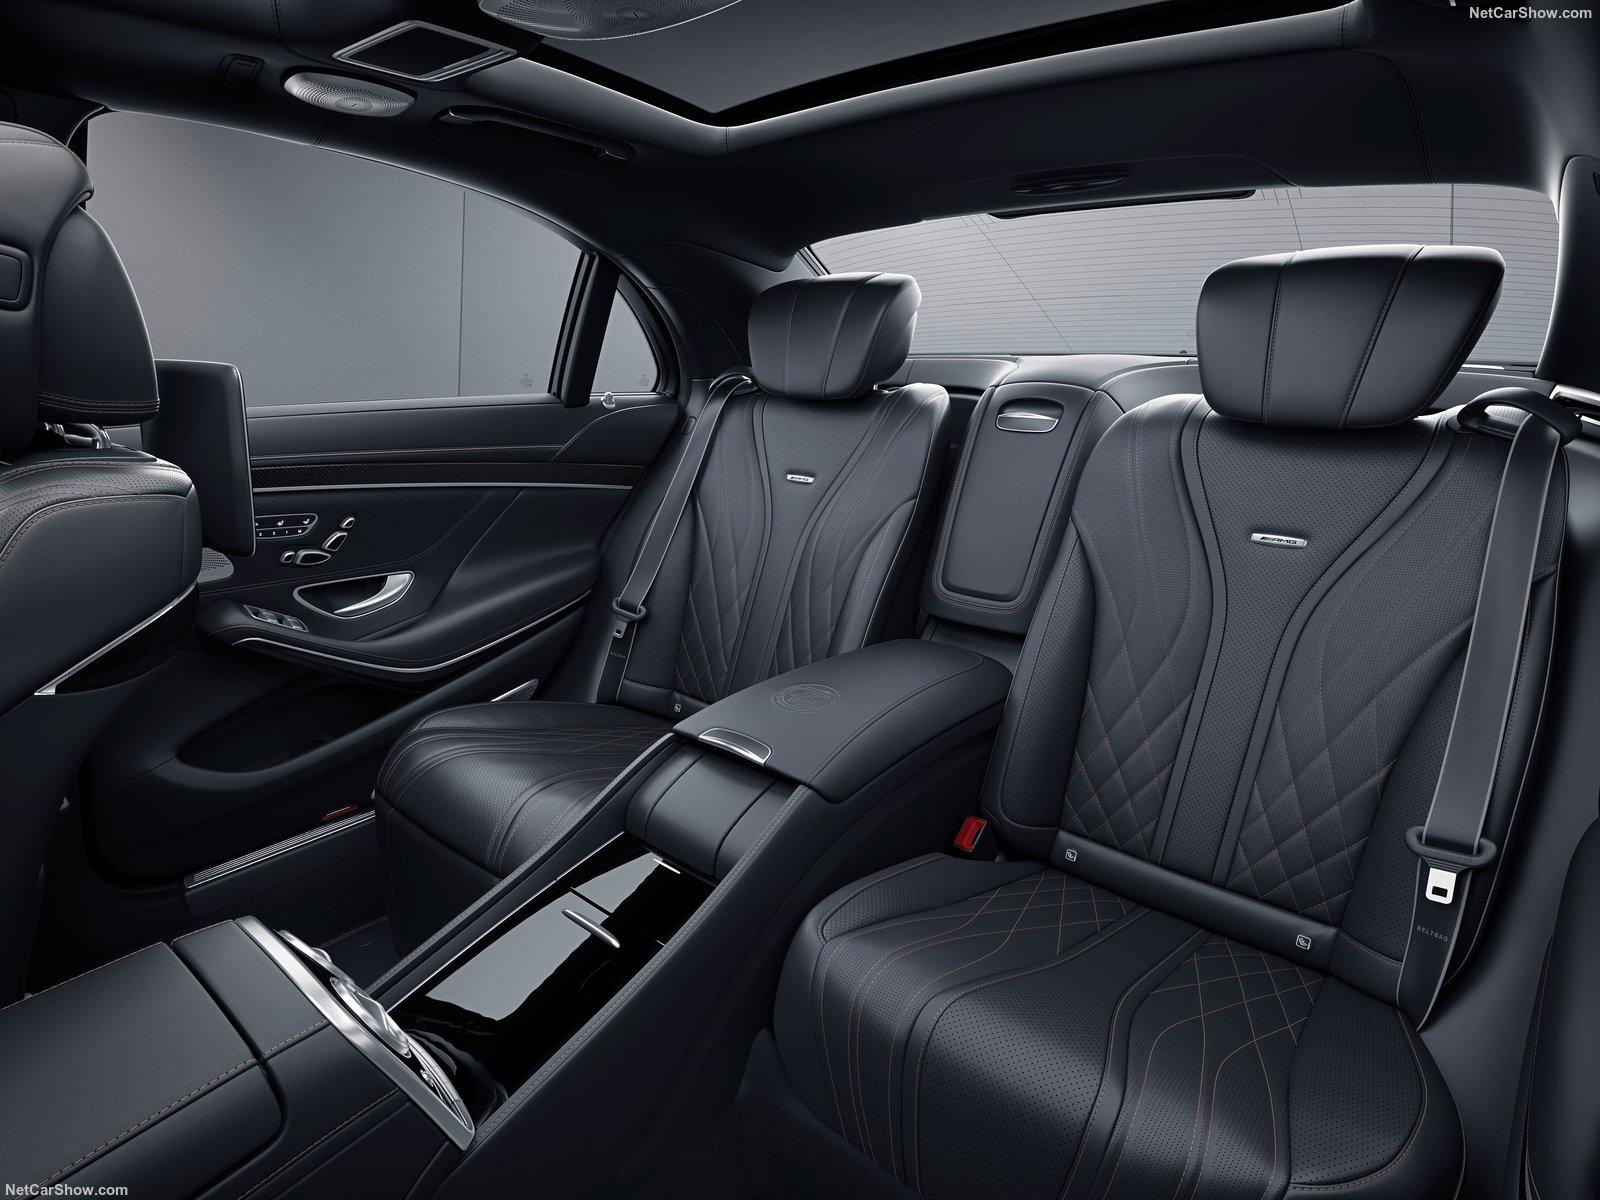 Mercedes S65 AMG Final Edition: lusso e potenza